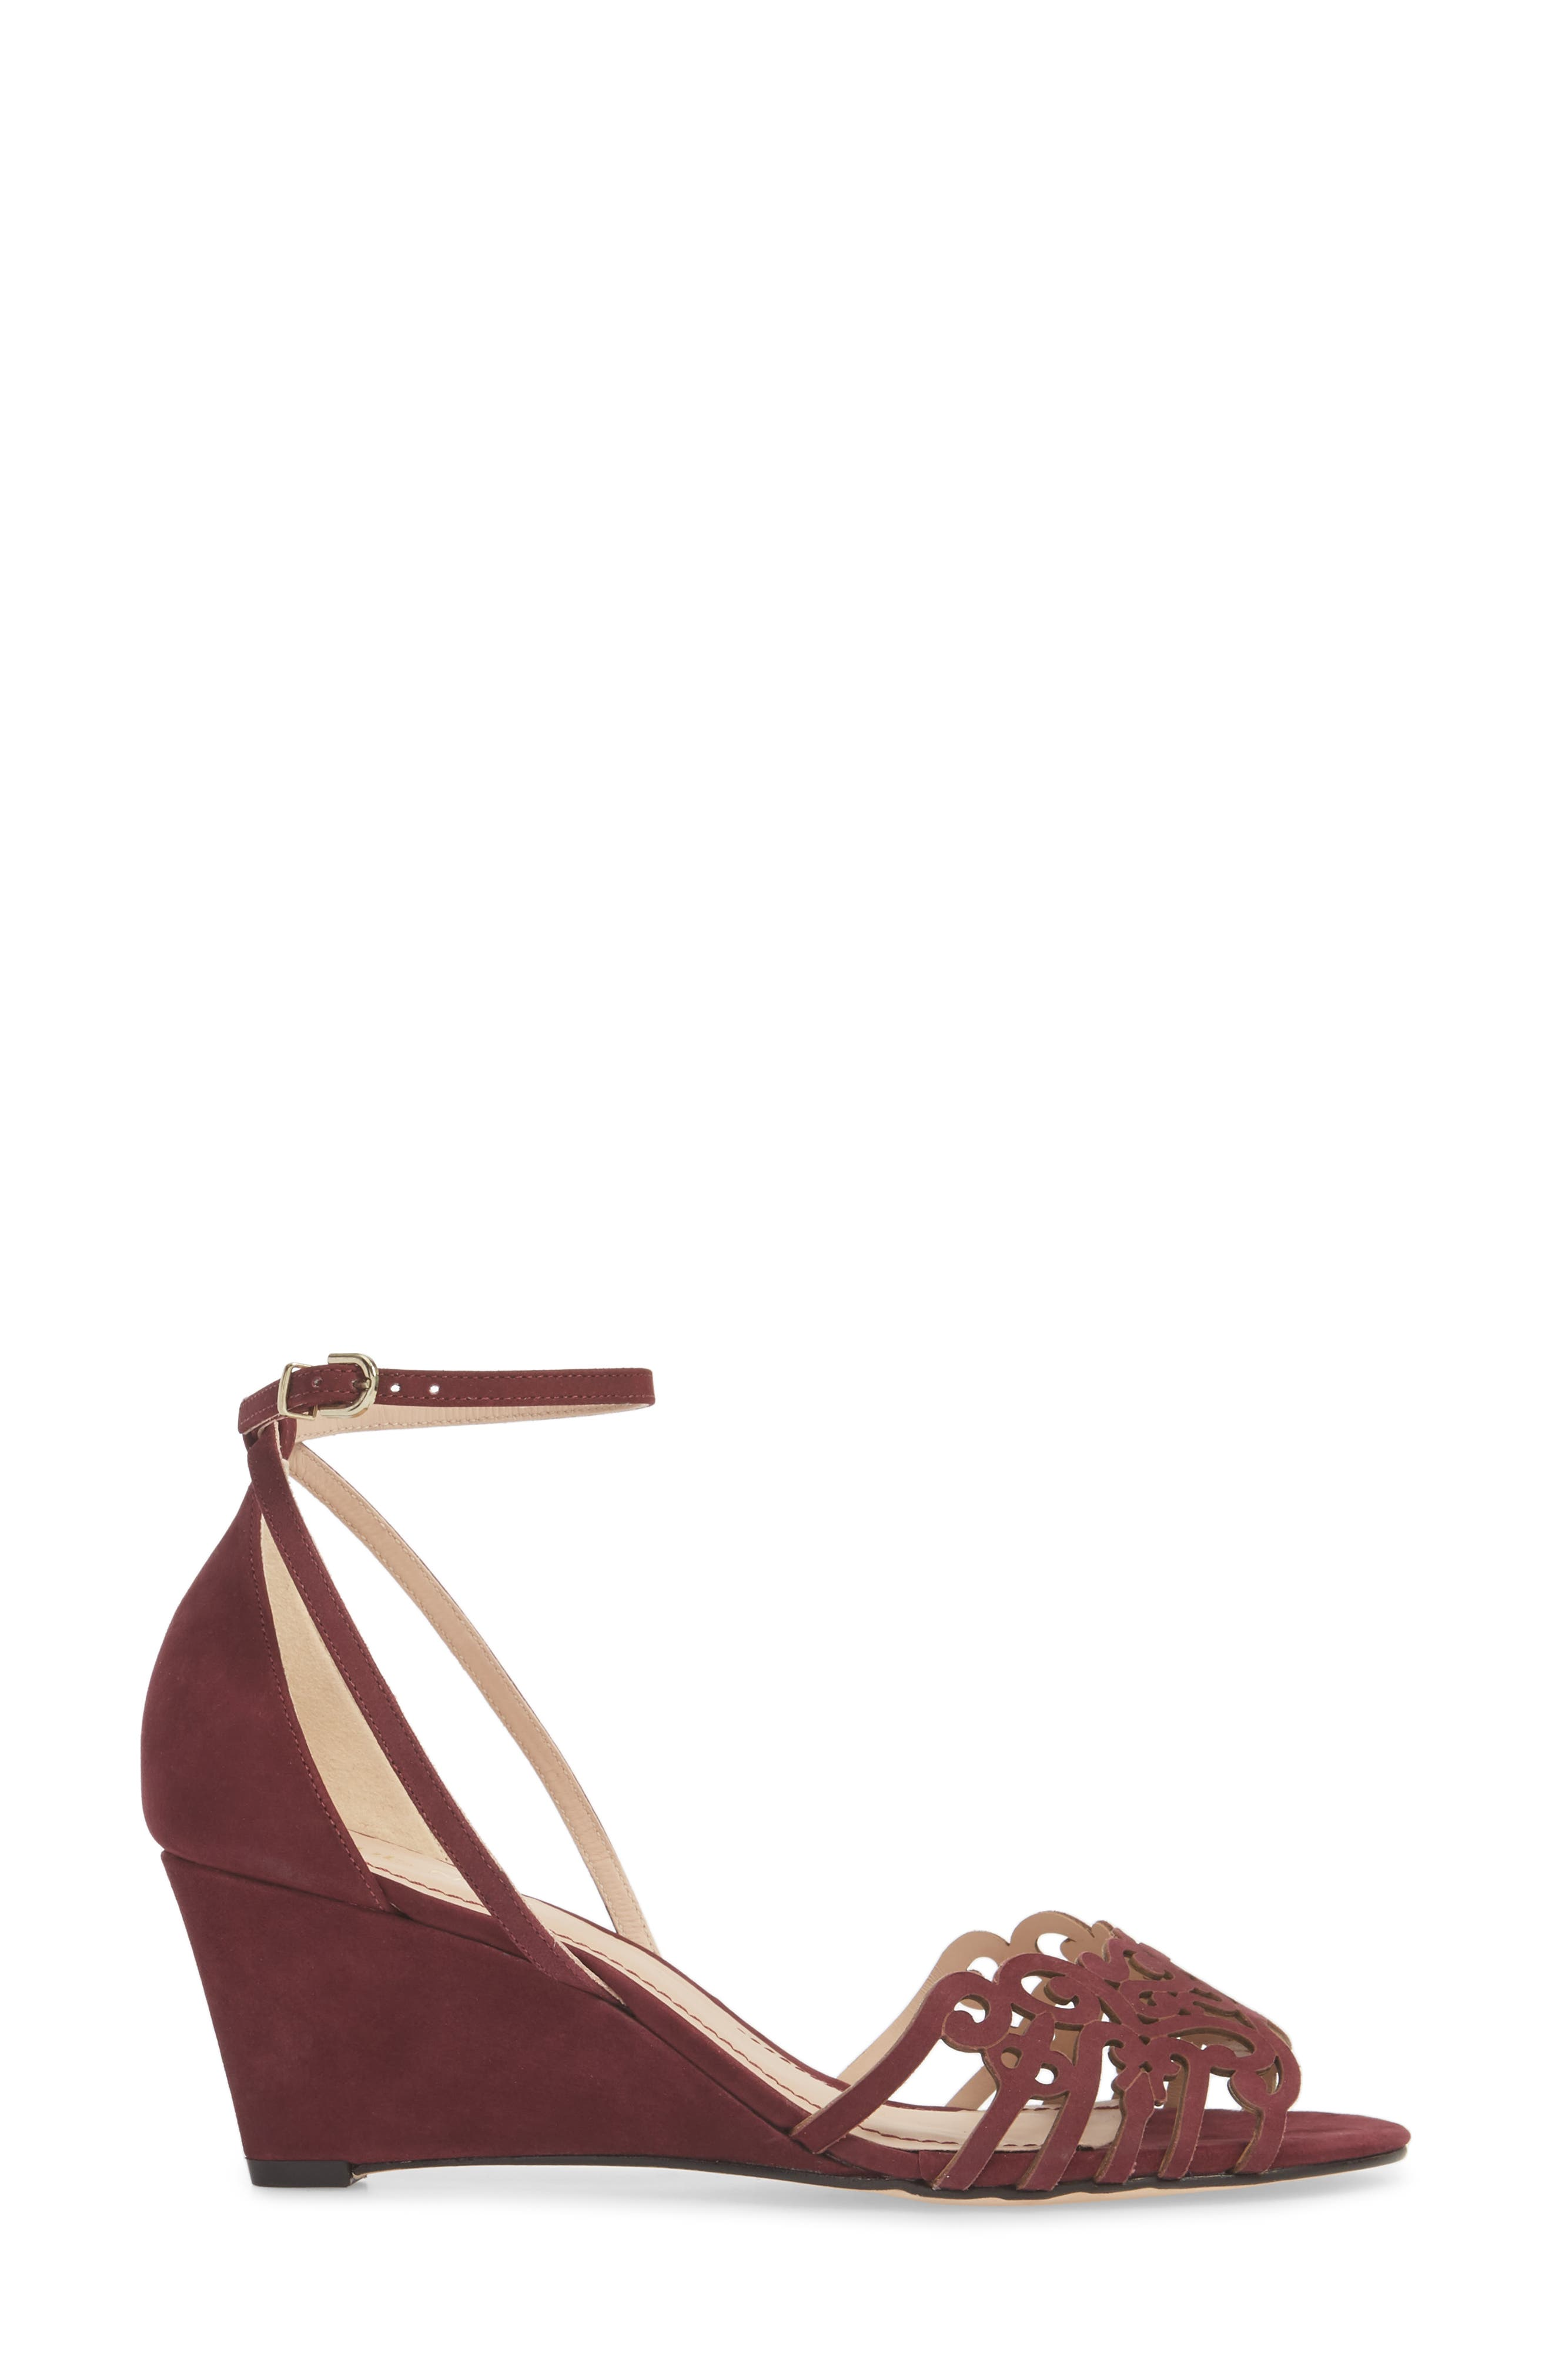 KLUB NICO, 'Kingston' Ankle Strap Wedge Sandal, Alternate thumbnail 3, color, WINE LEATHER